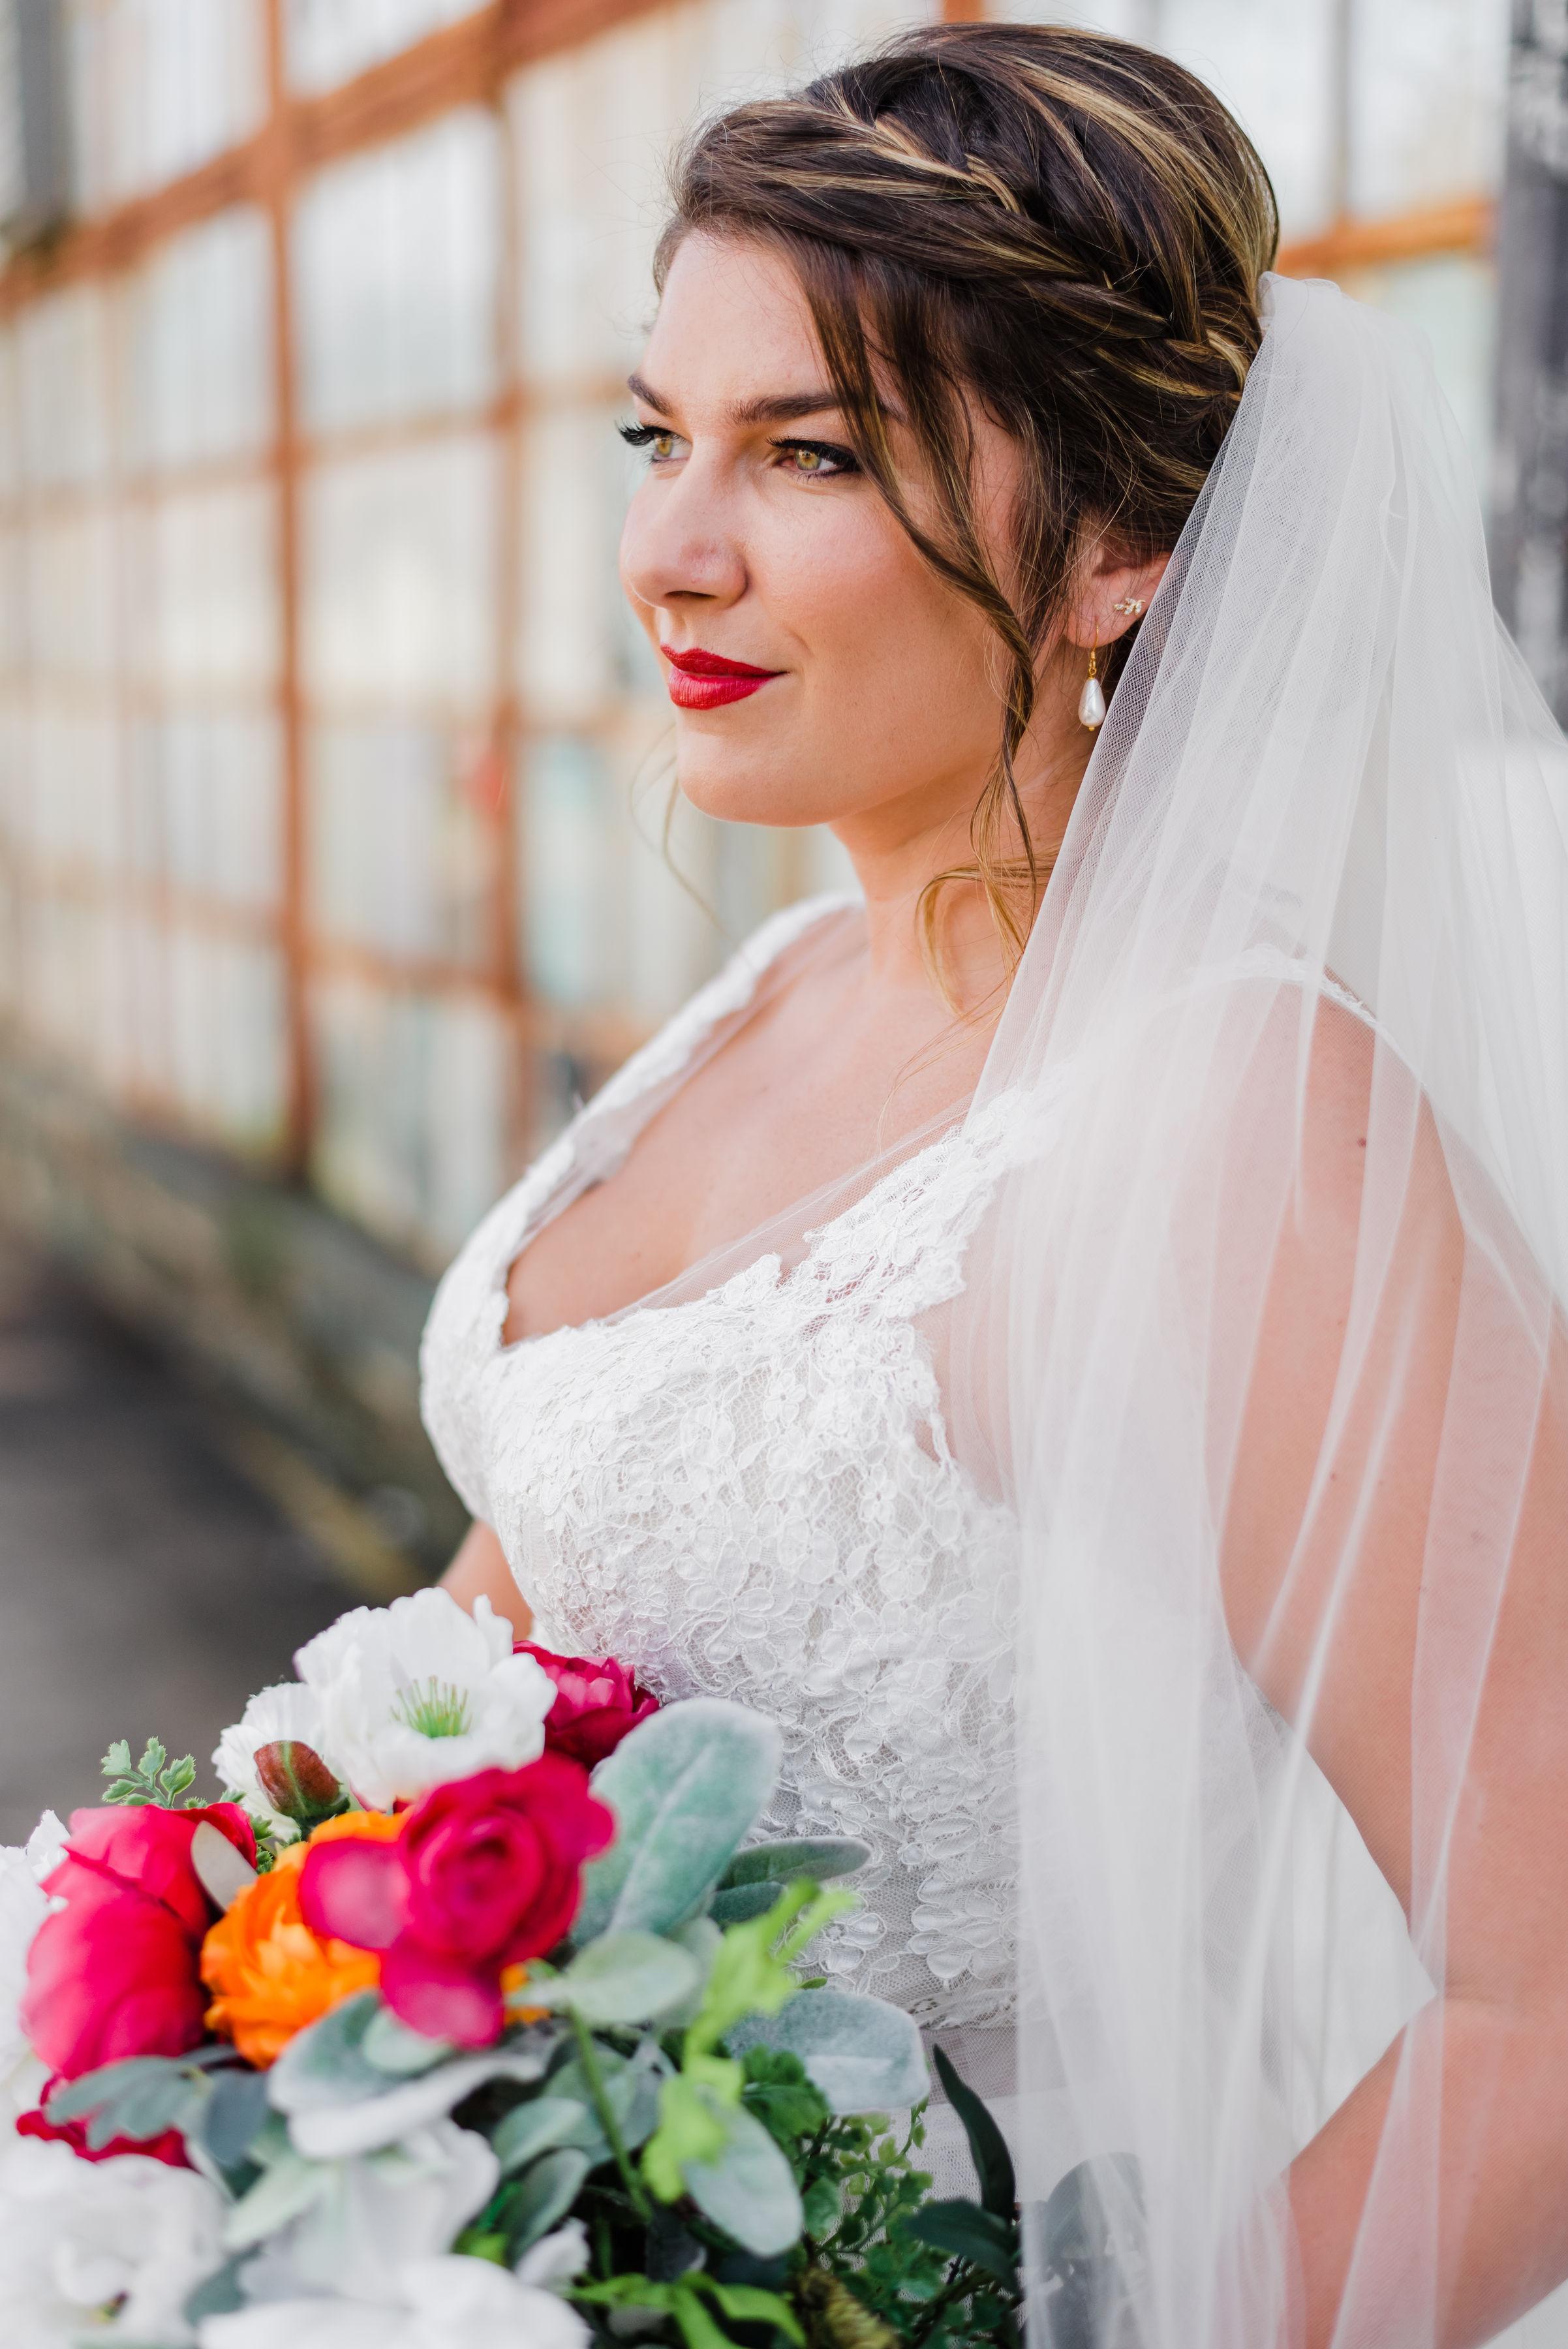 TaylorAdams_bridals-122.jpg